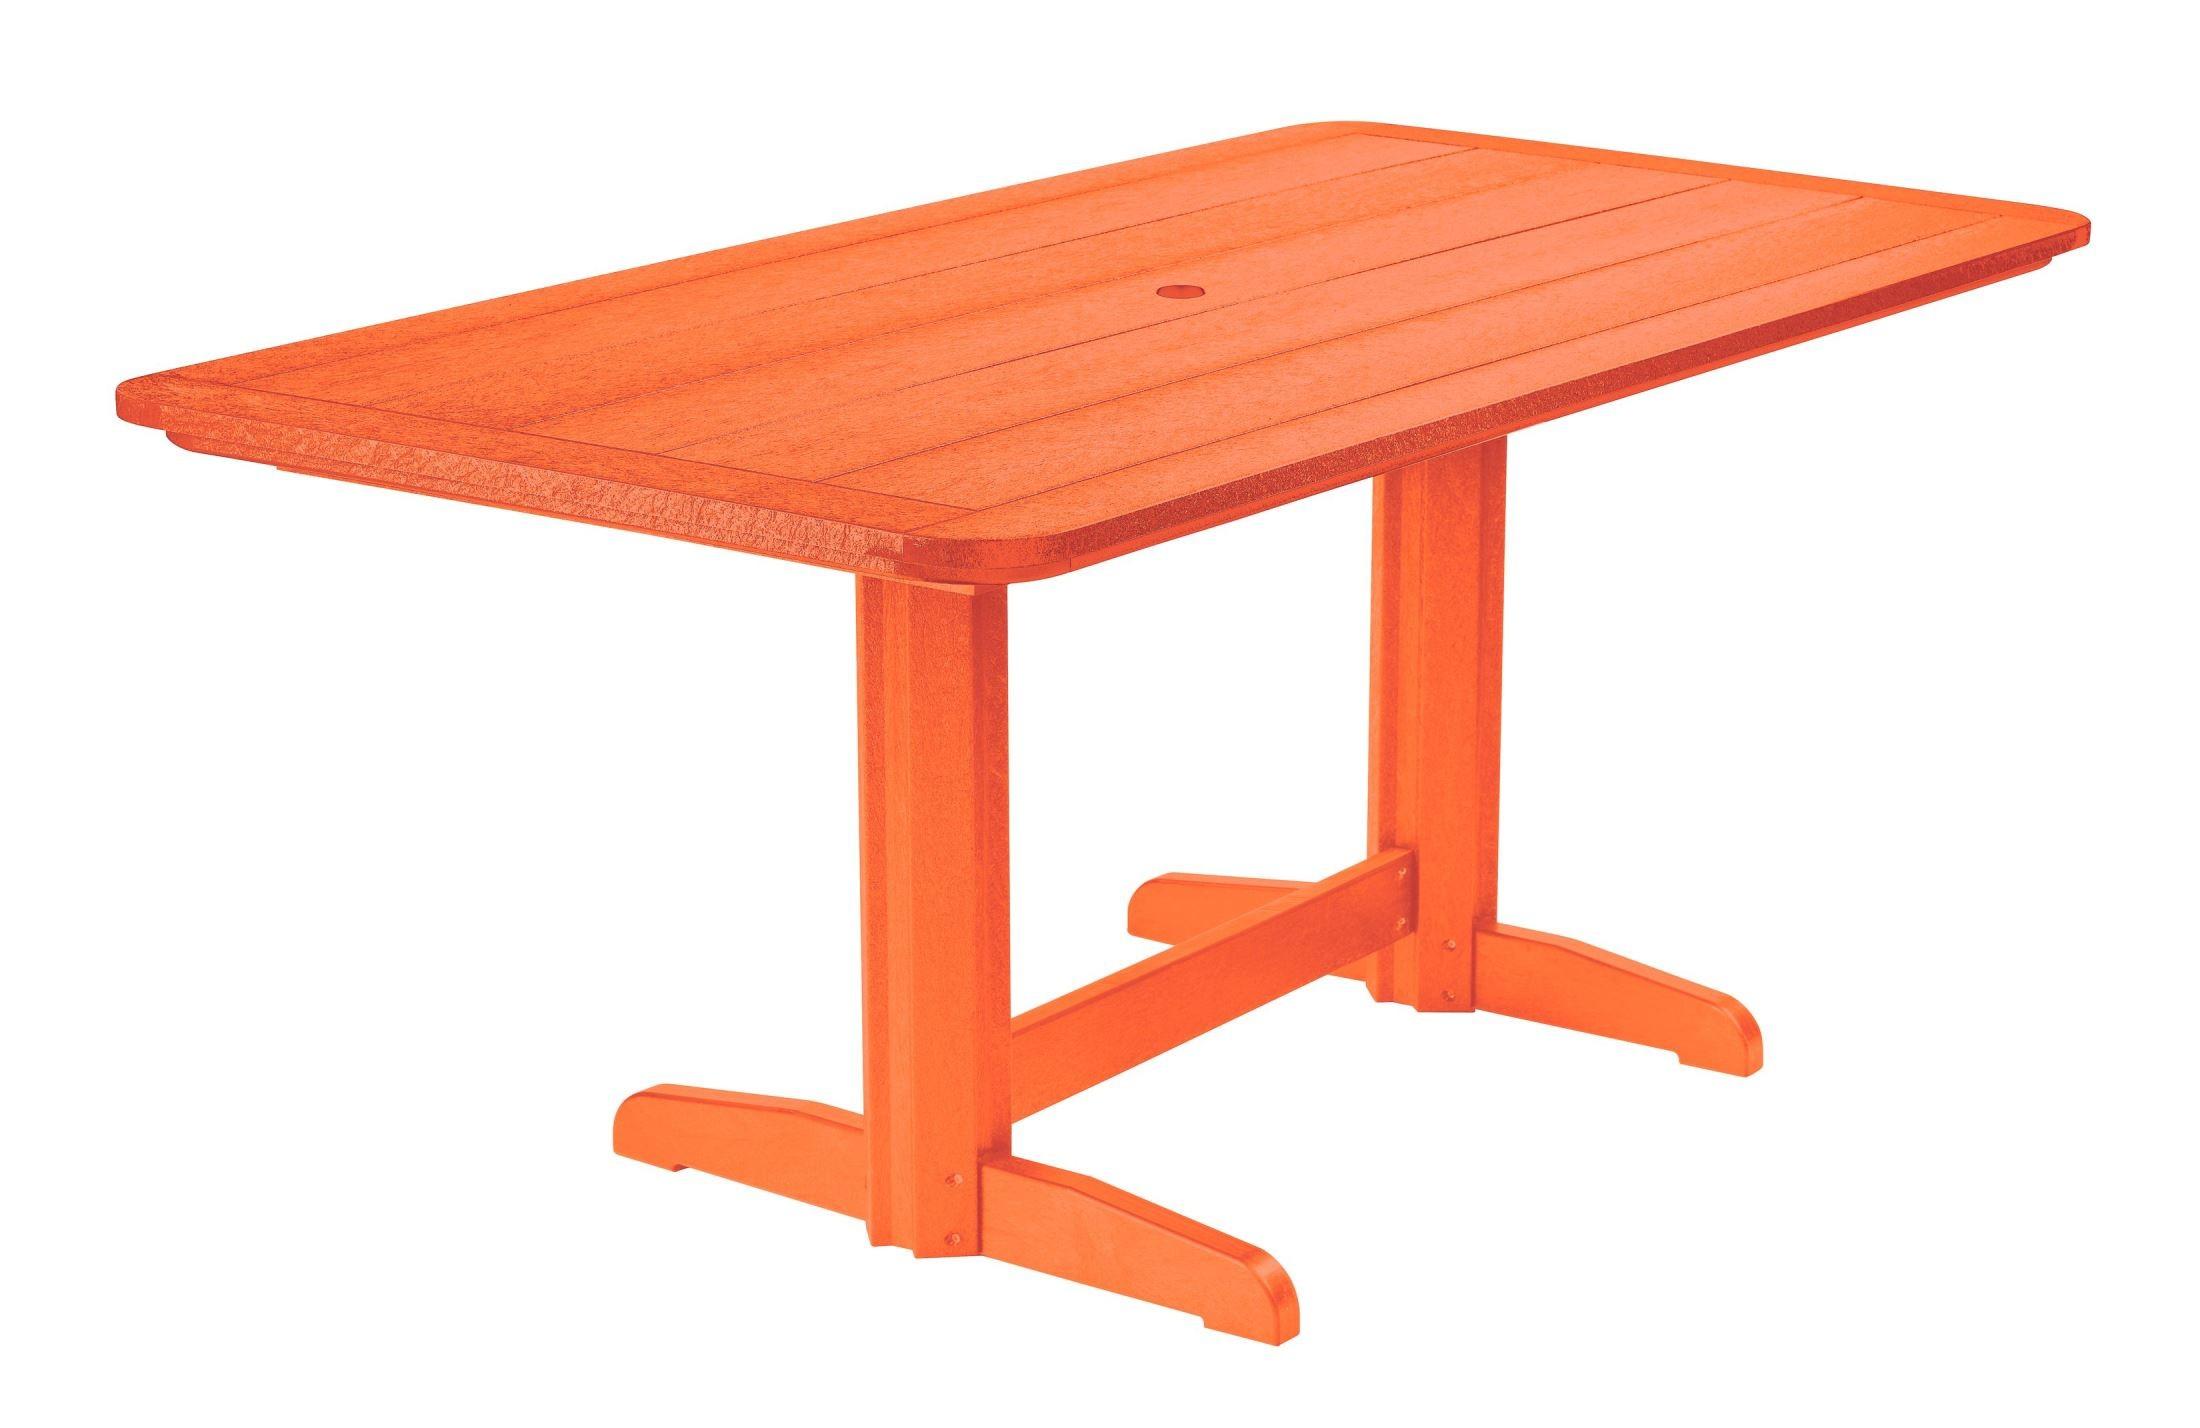 Generations orange 36 double pedestal dining table from for Double pedestal dining table plans